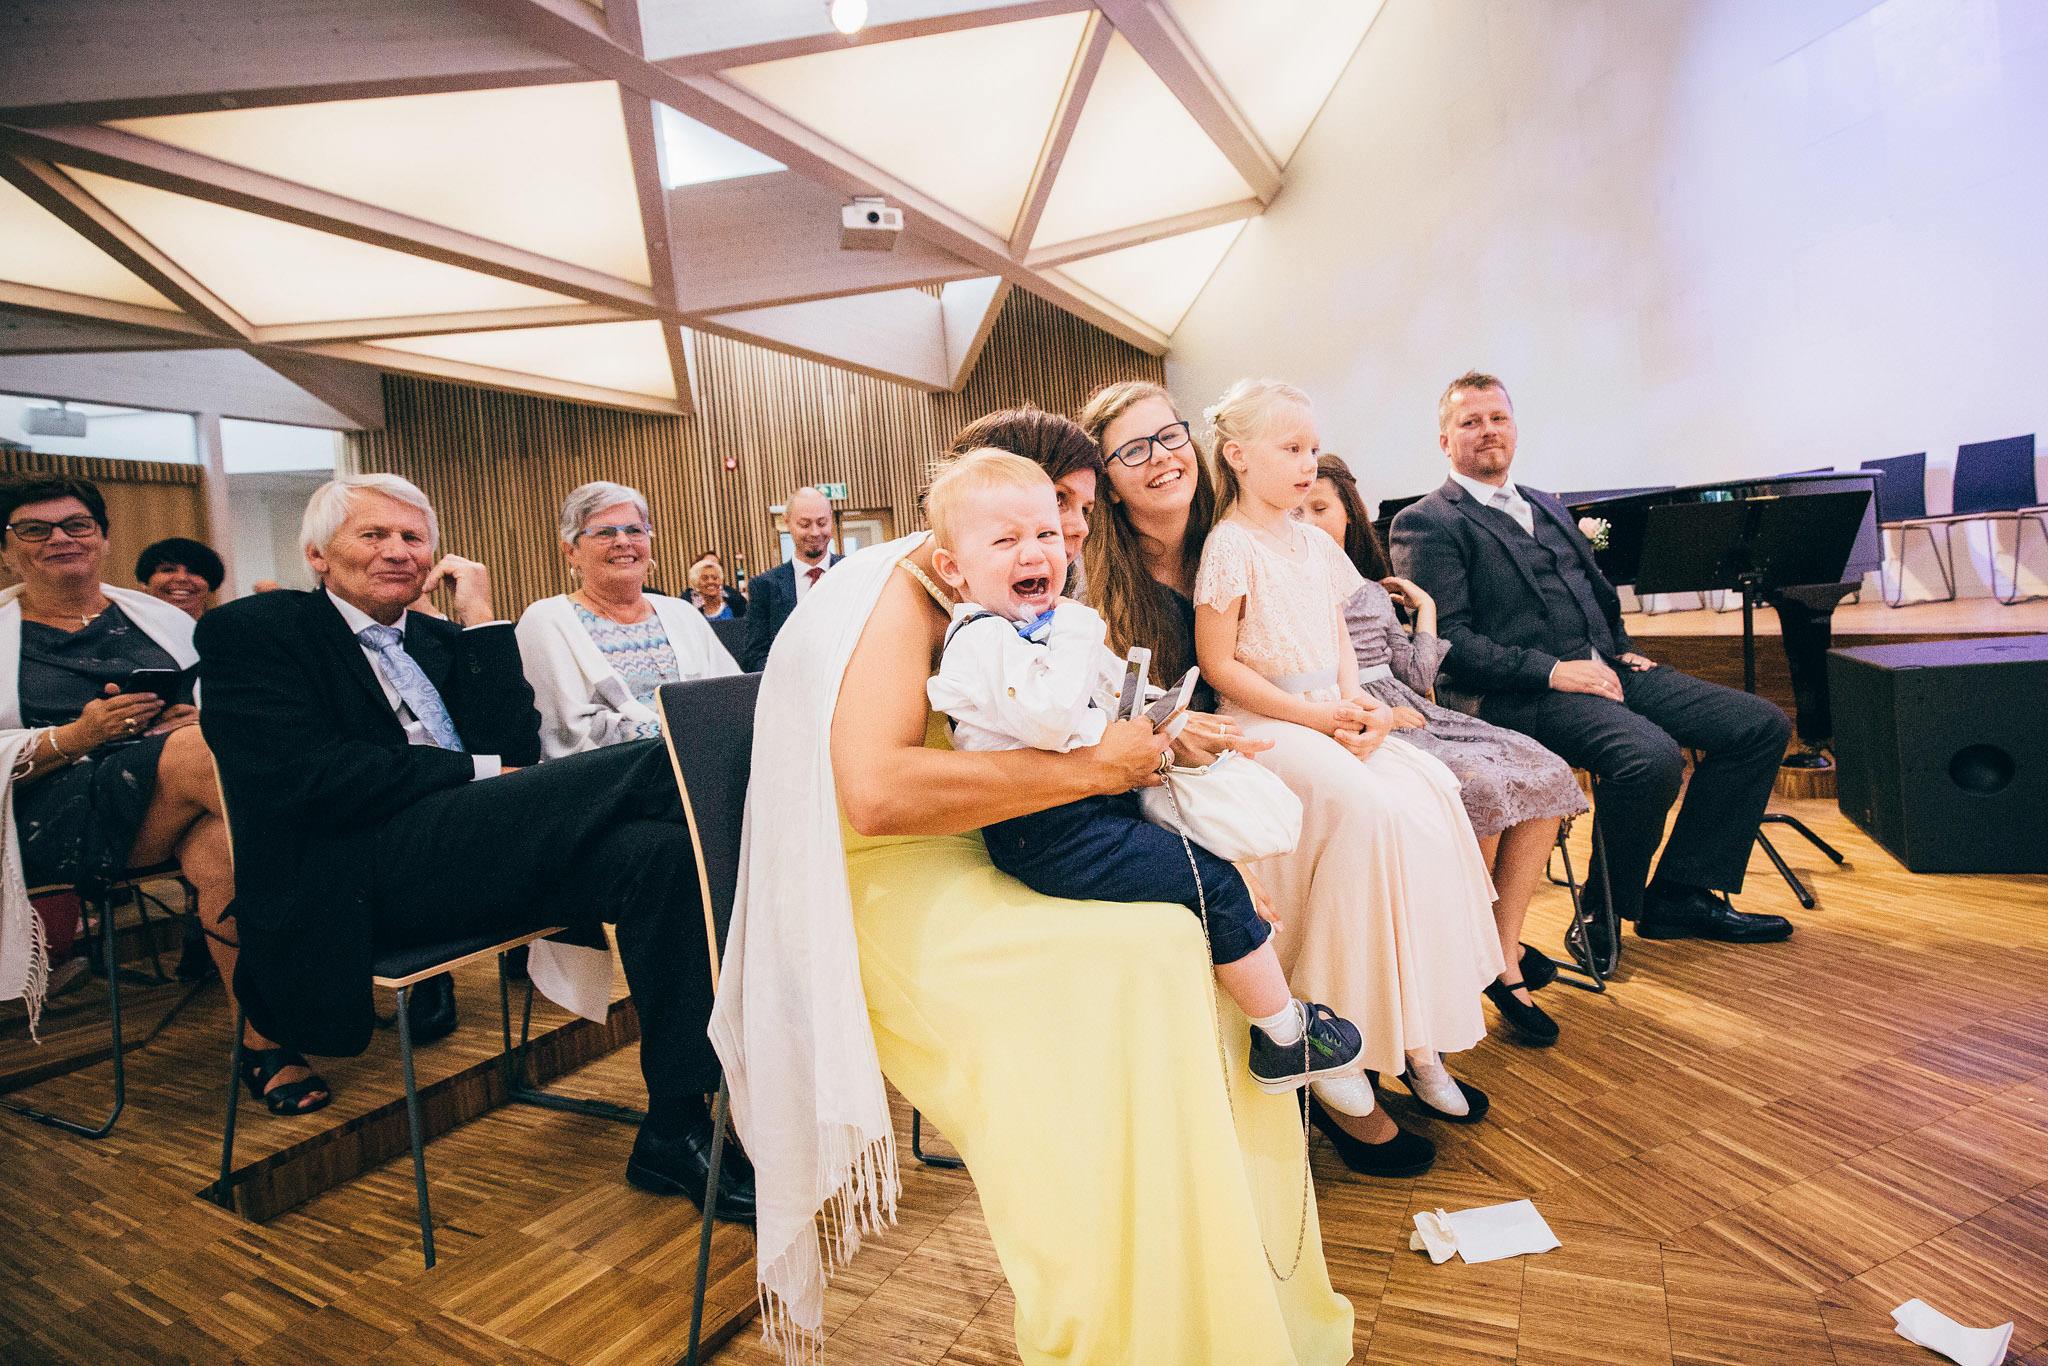 Norway+wedding+photographer+elopement+pre+wedding+Casey+Arneson-40.jpg